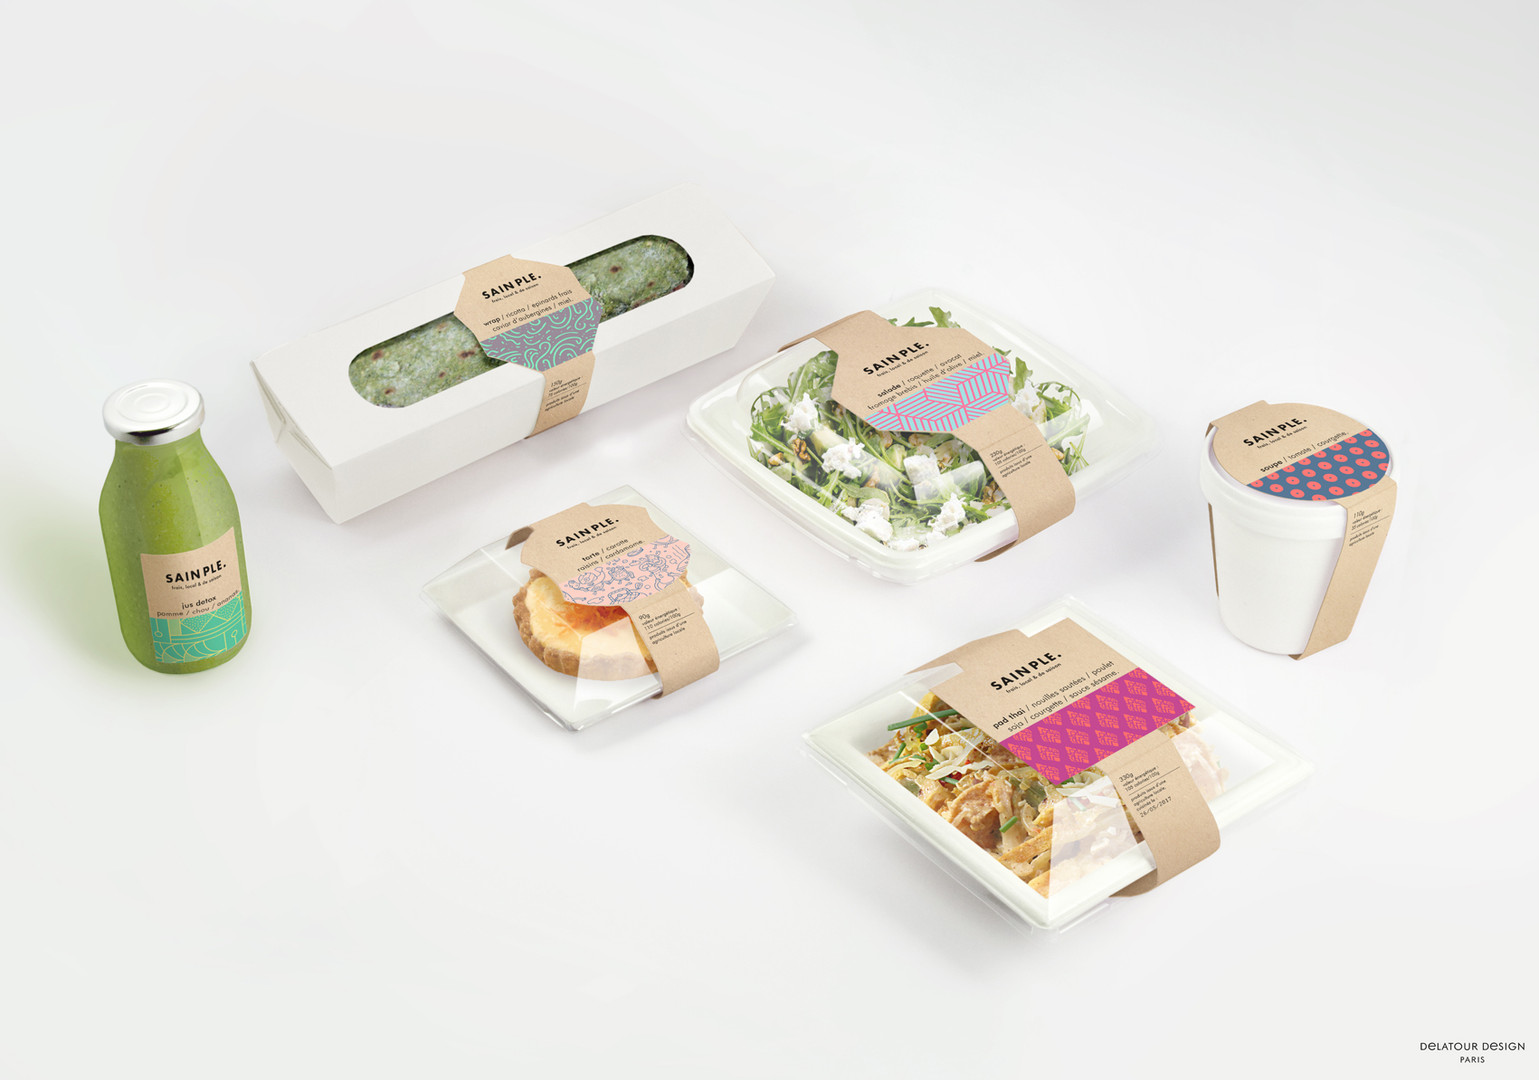 surpack-sainple-v1b-food-PREZ.jpg